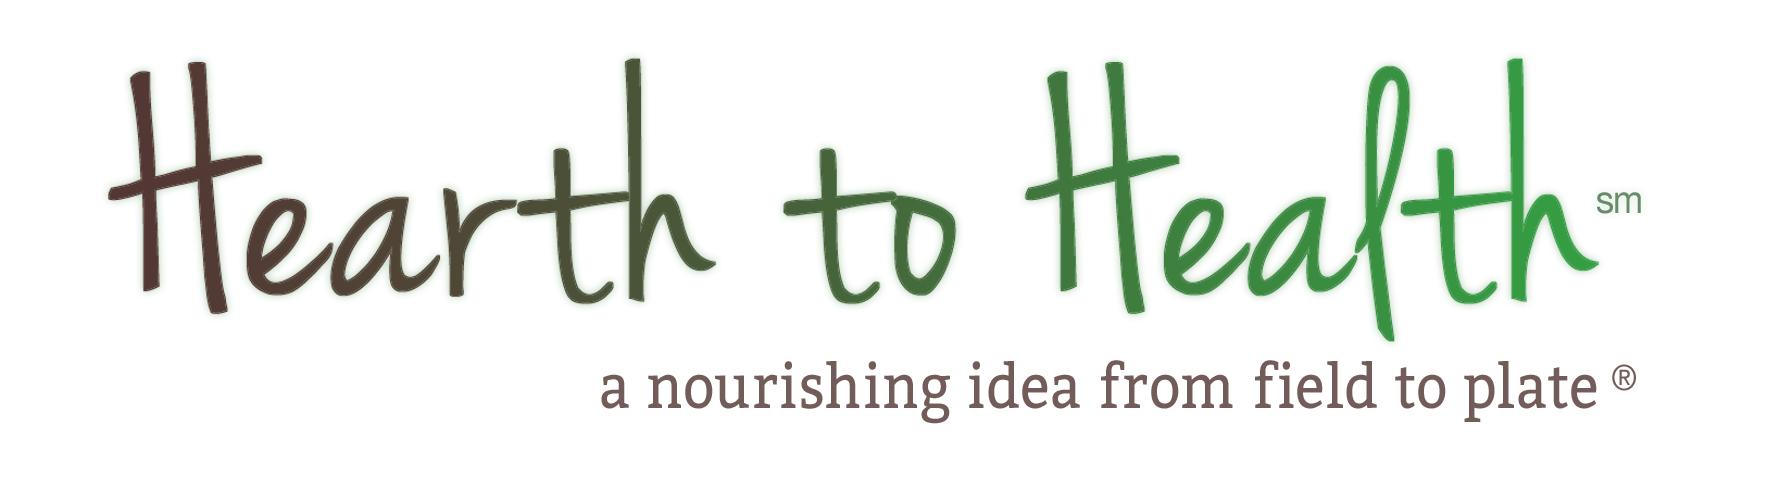 HTH-logo with biline.jpg